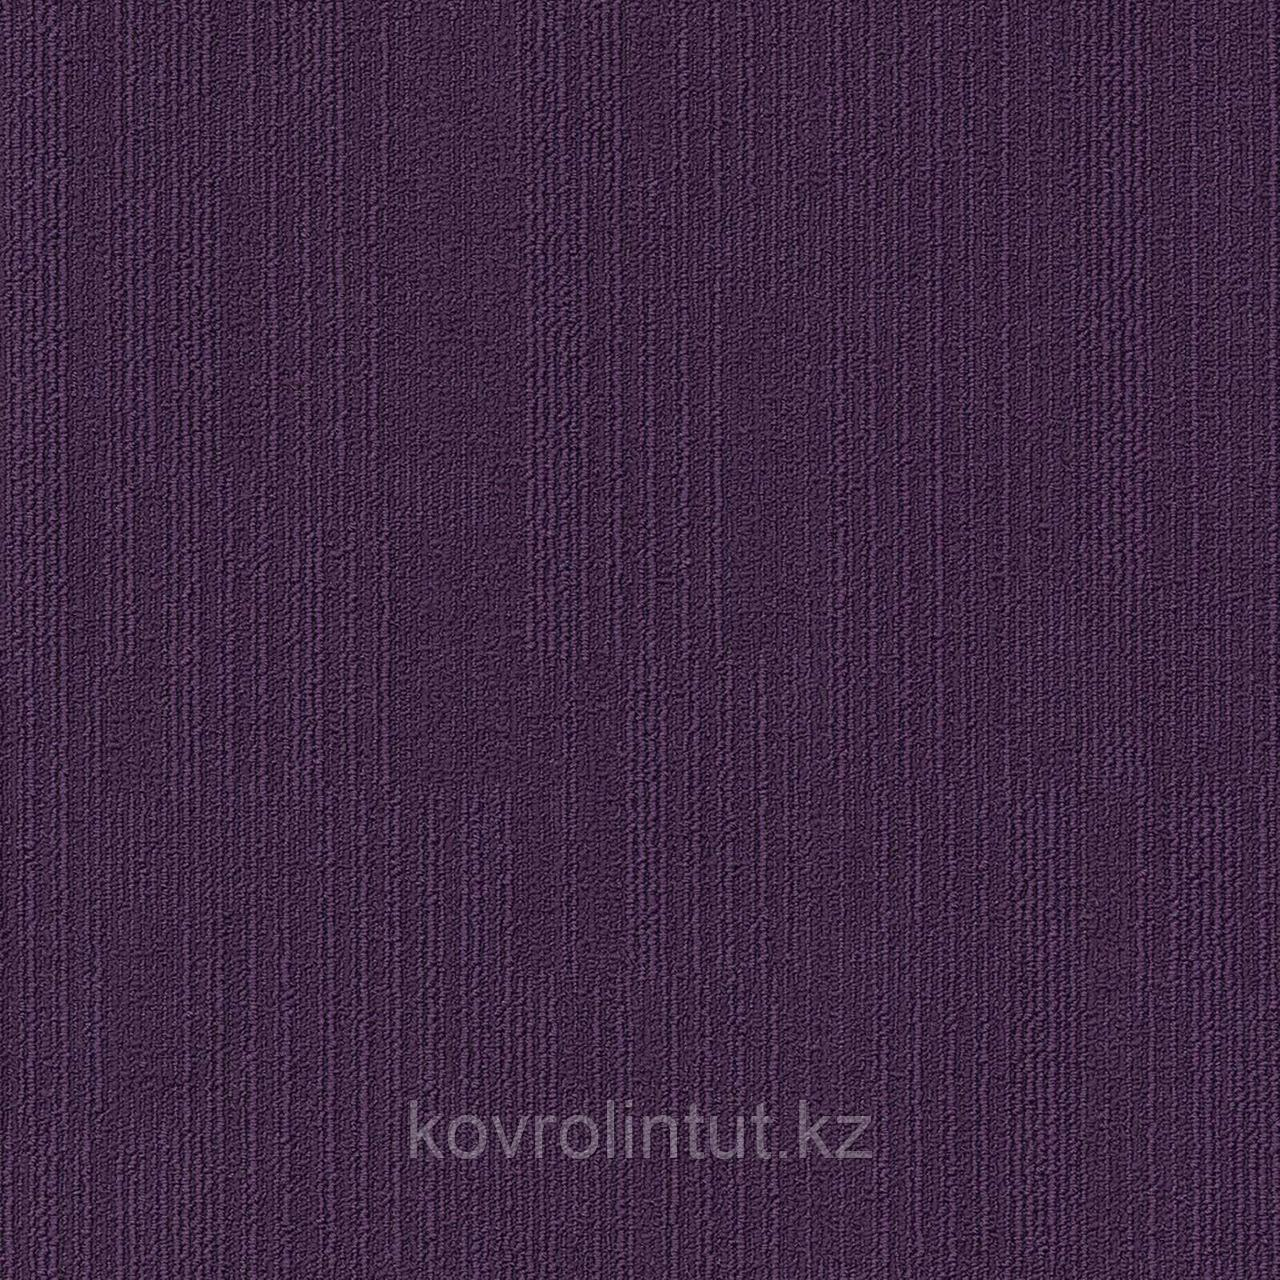 Плитка ковровая Modulyss Fashion 431, 100% PA